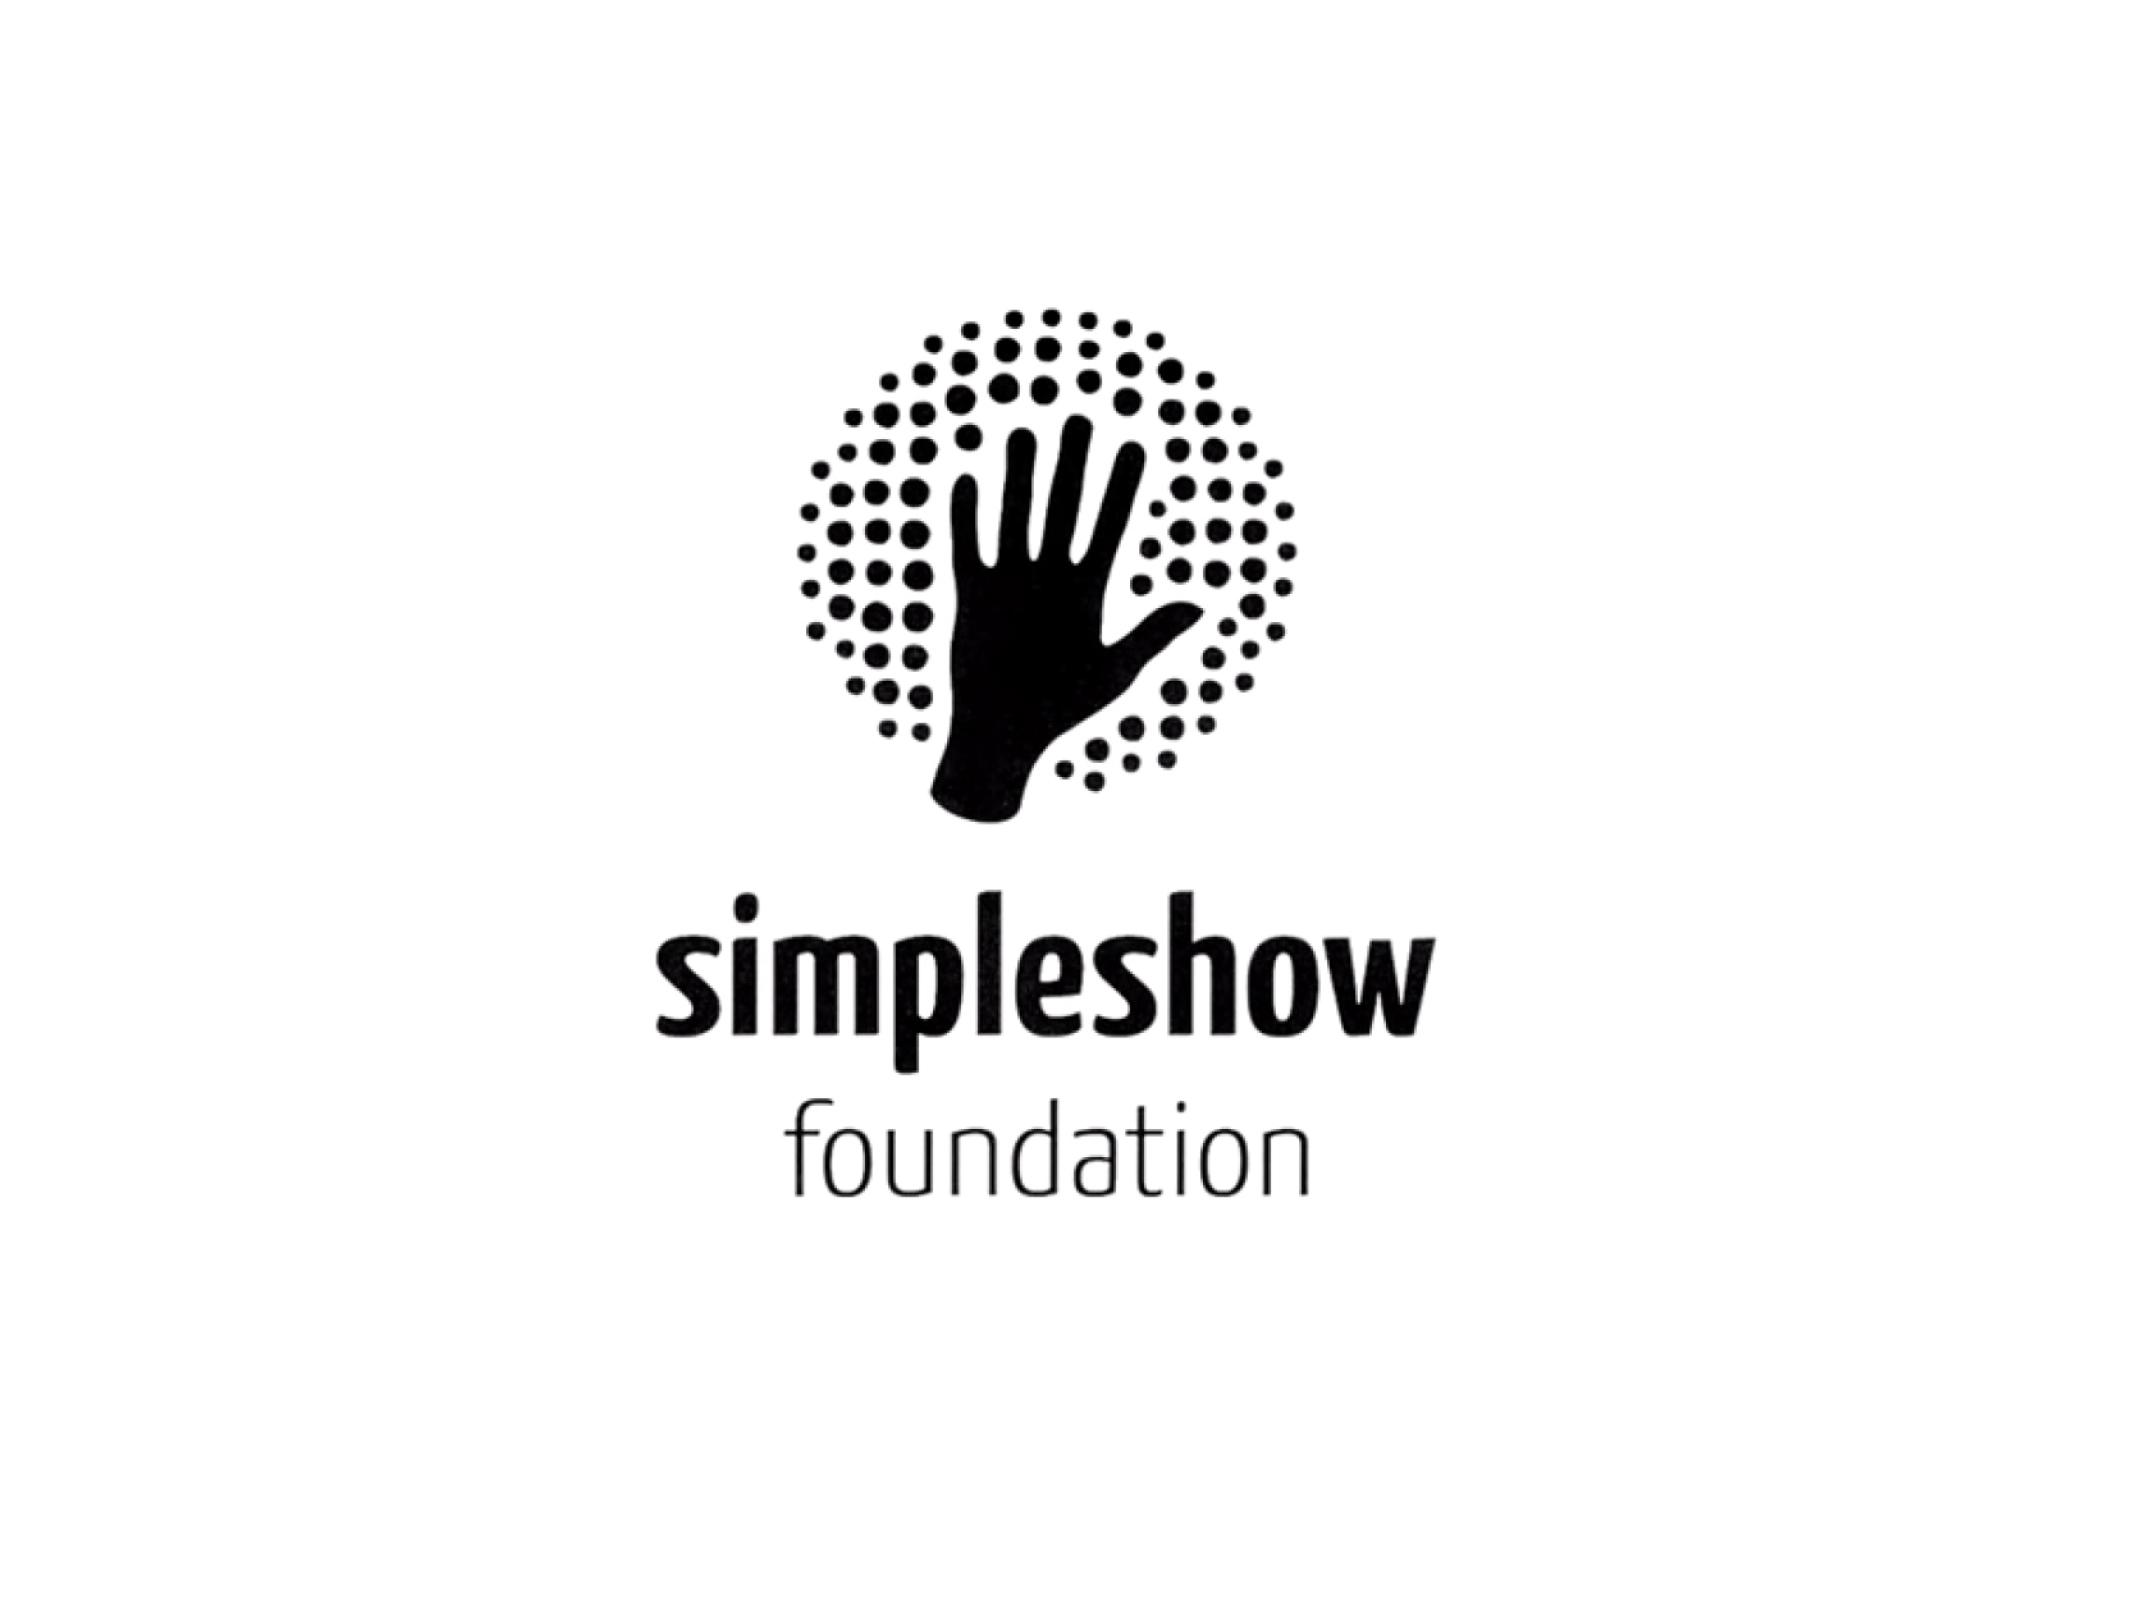 ATK-Simpleshow-Foundation-Logo-Design-2.jpg